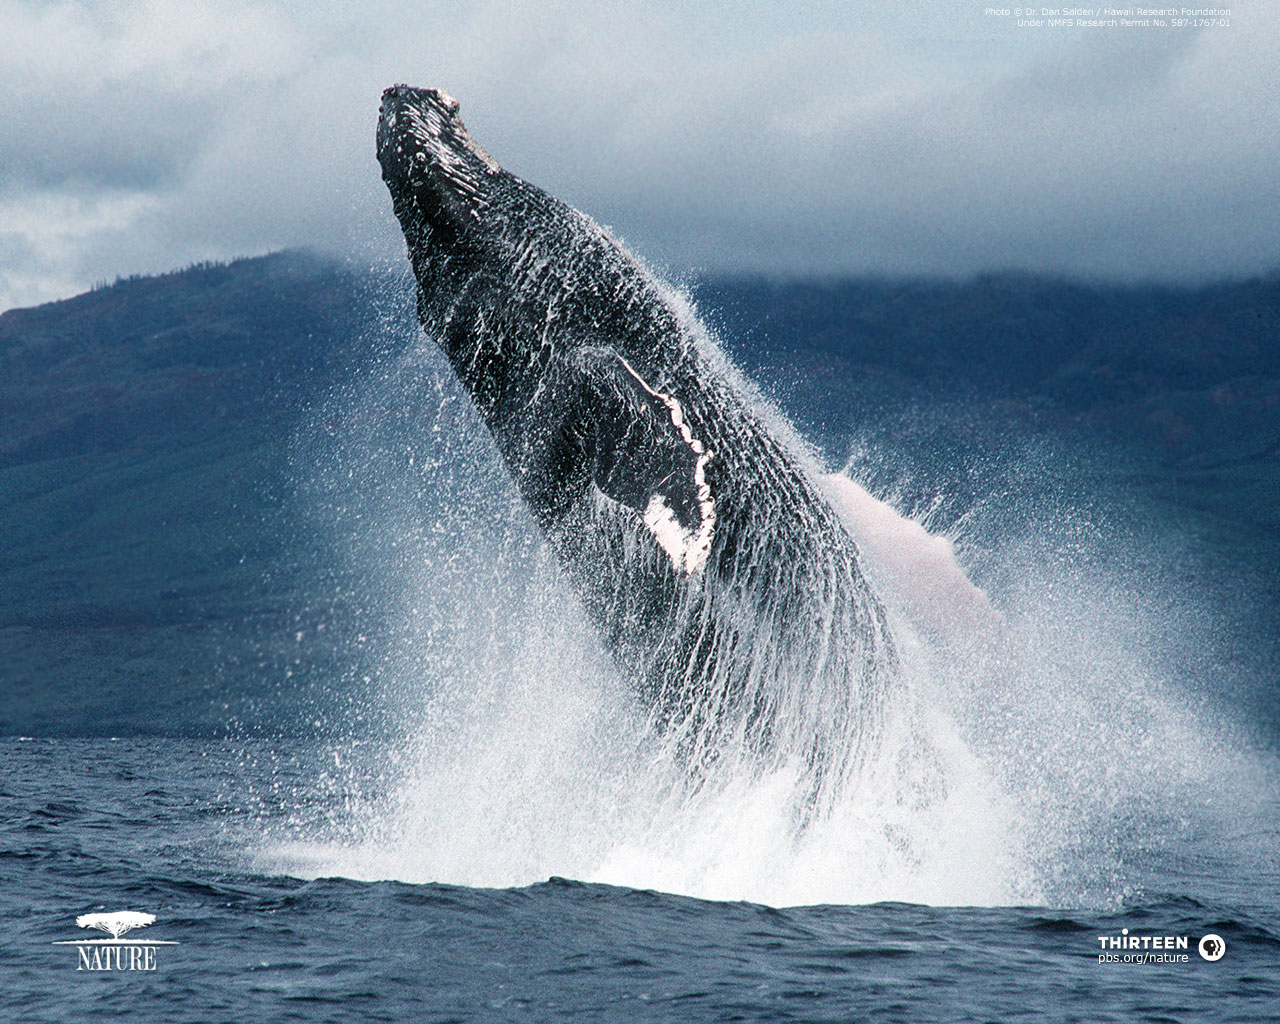 Download Humpback Whale Wallpaper 1280x1024